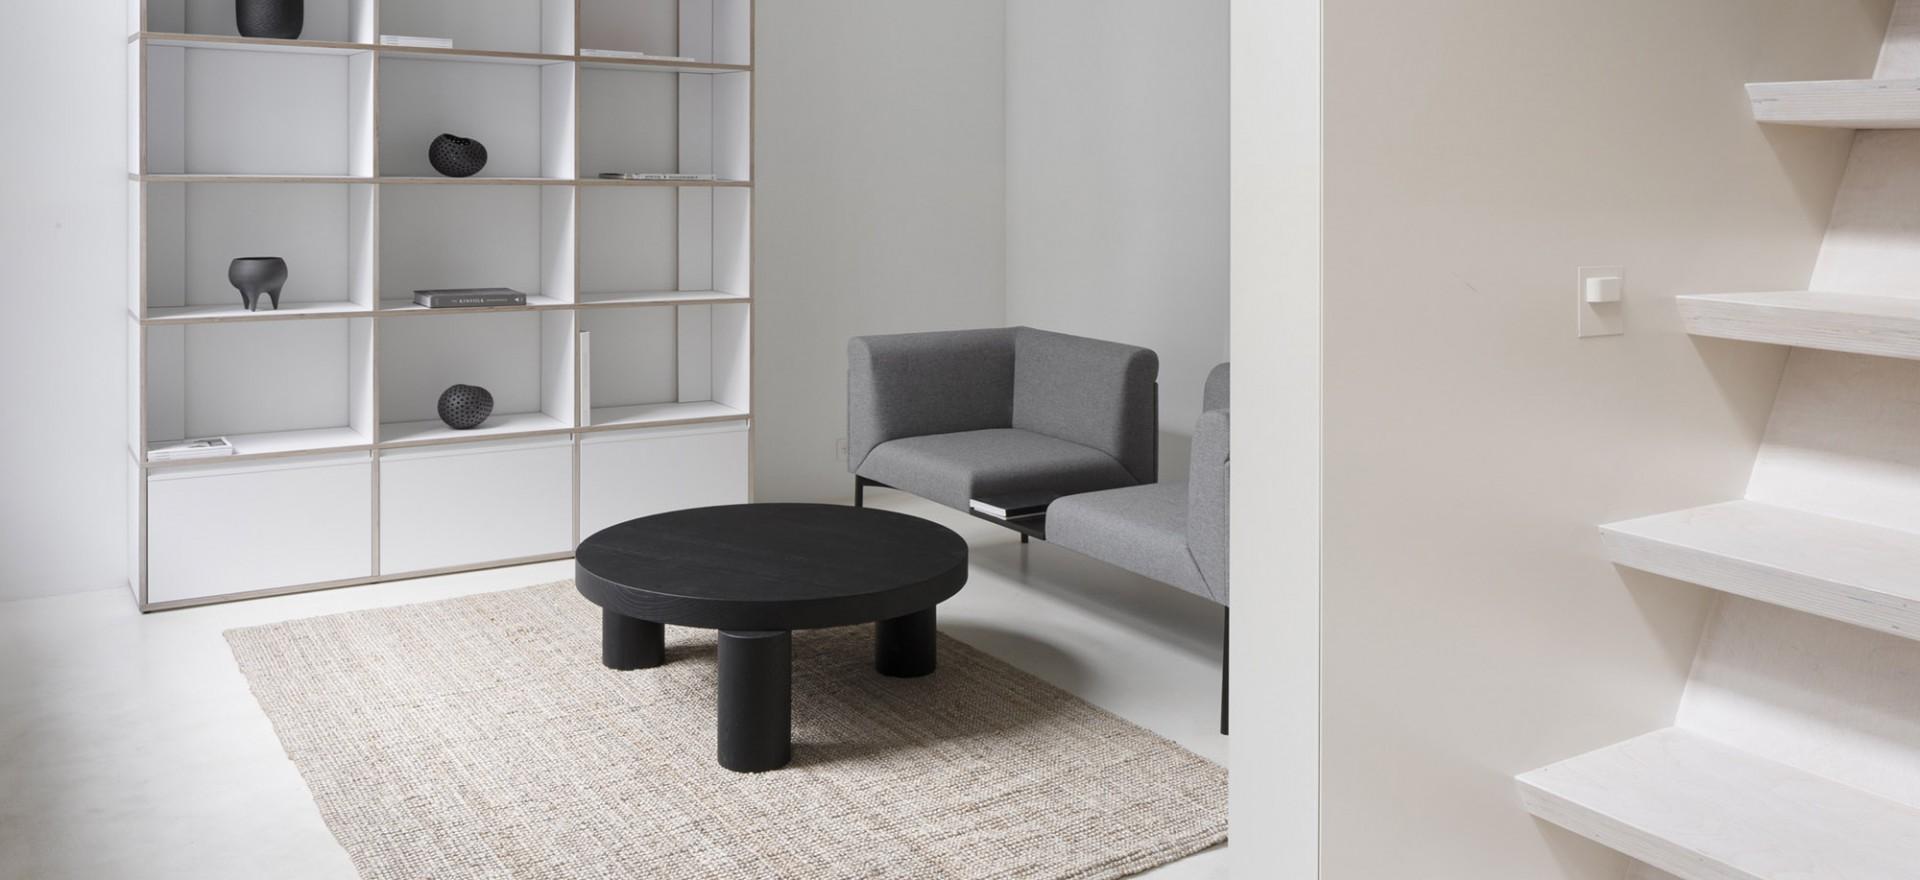 thisispaper_aplace_apartment_interior_design_warsaw_berlin_maja_wirkus_photography_13 copy 1